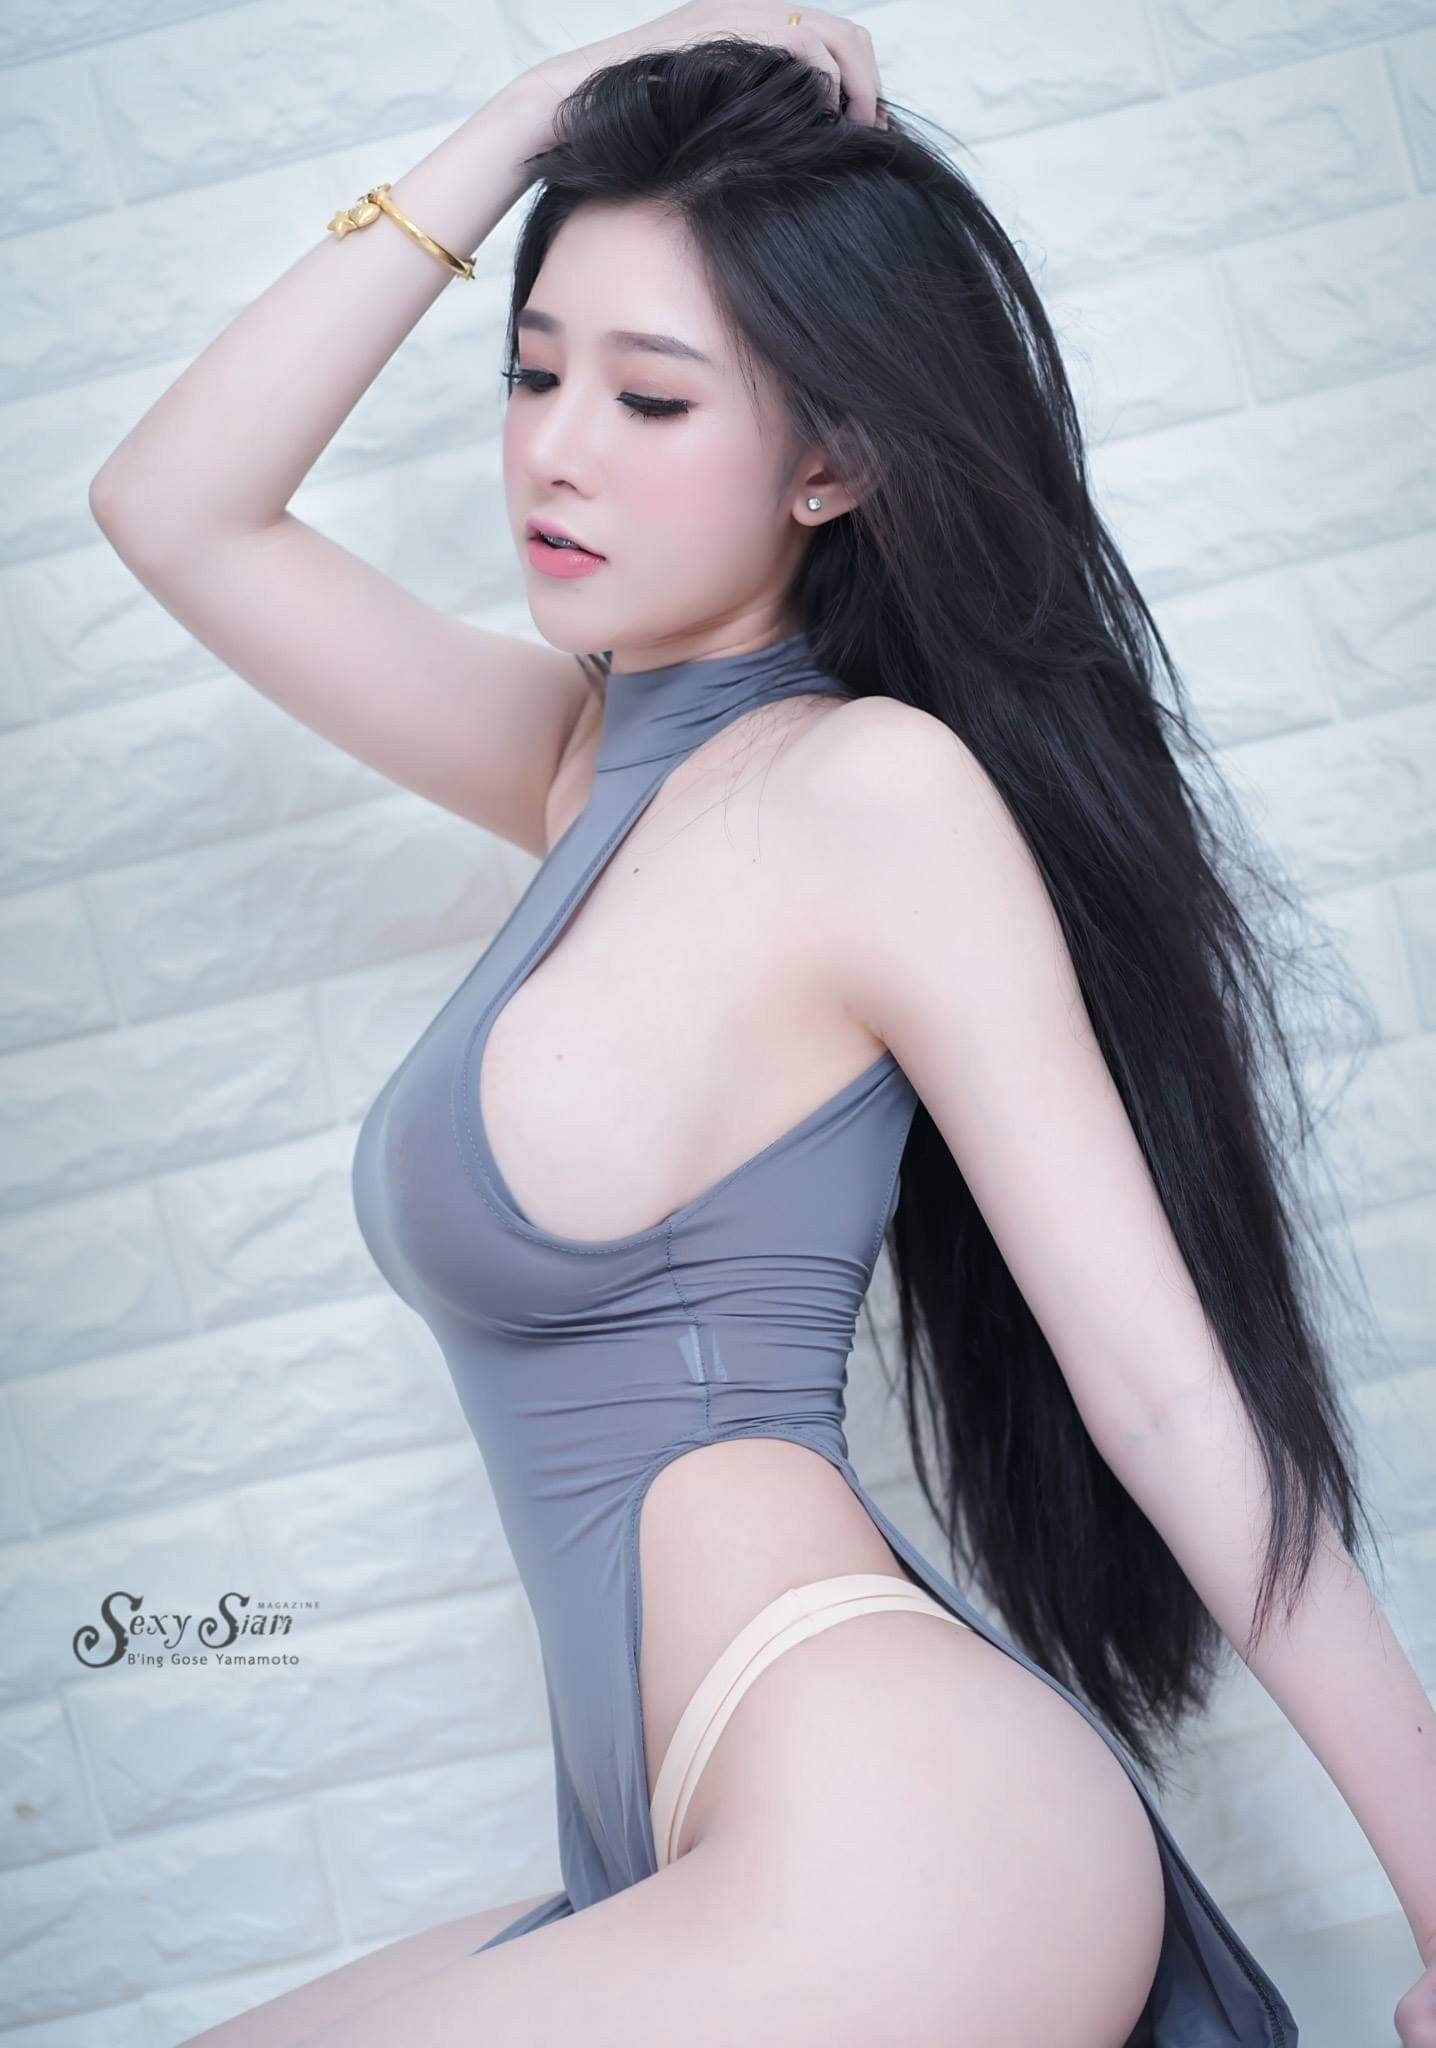 Hot Jestina Lam nude photos 2019